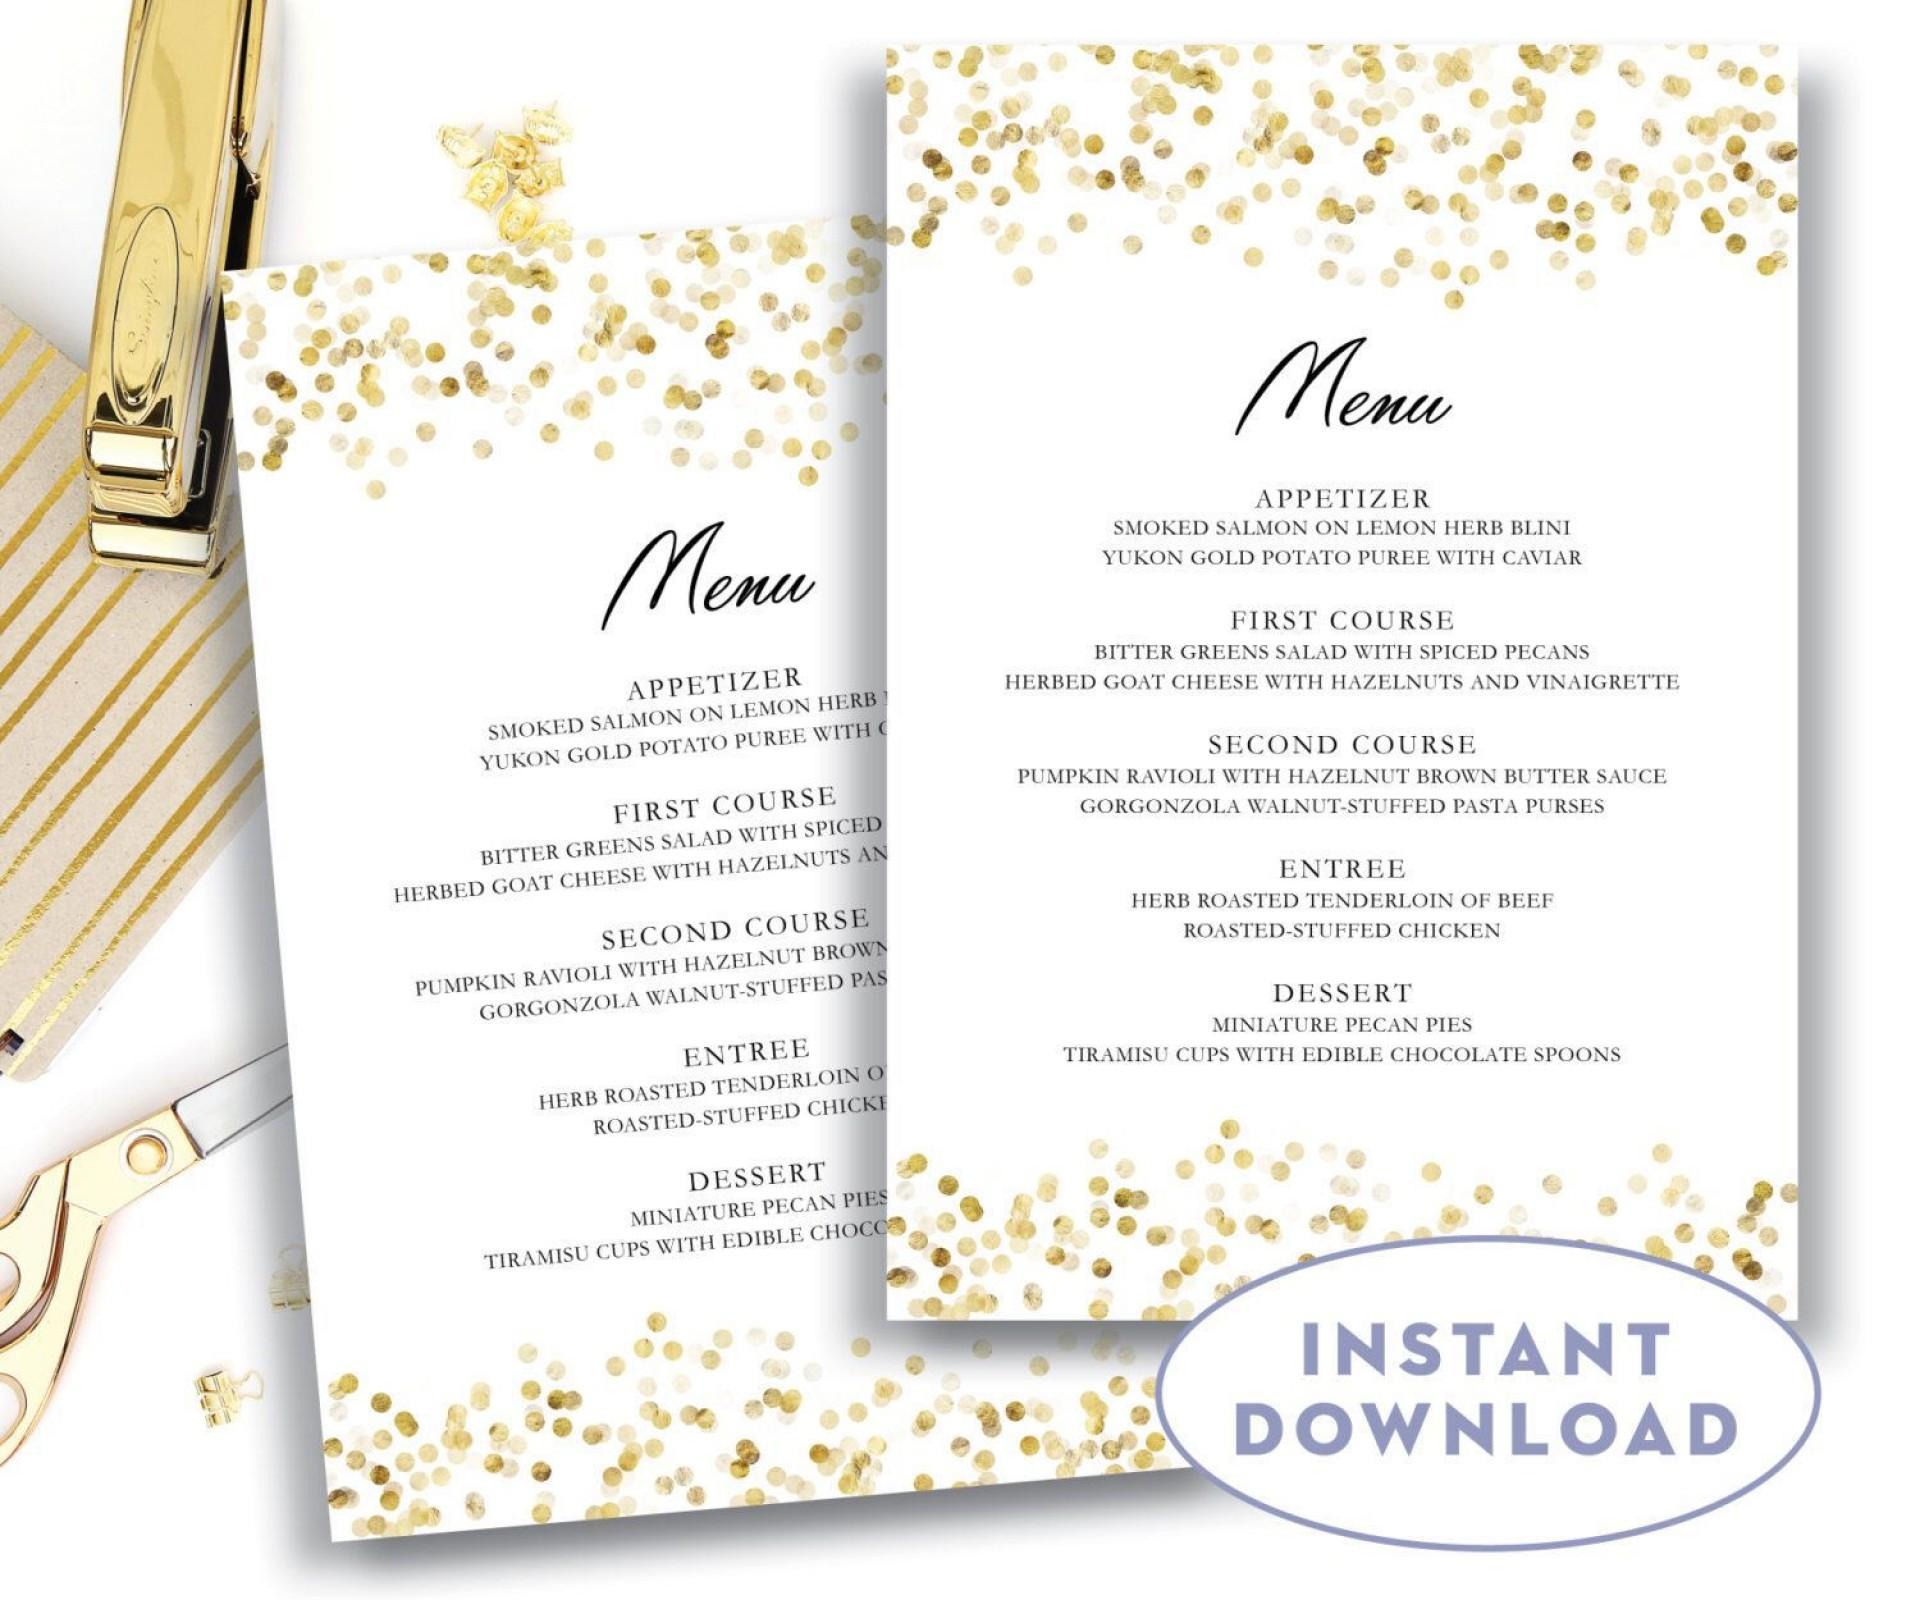 004 Awesome Menu Card Template Free Download Inspiration  Indian Restaurant Design Cafe1920